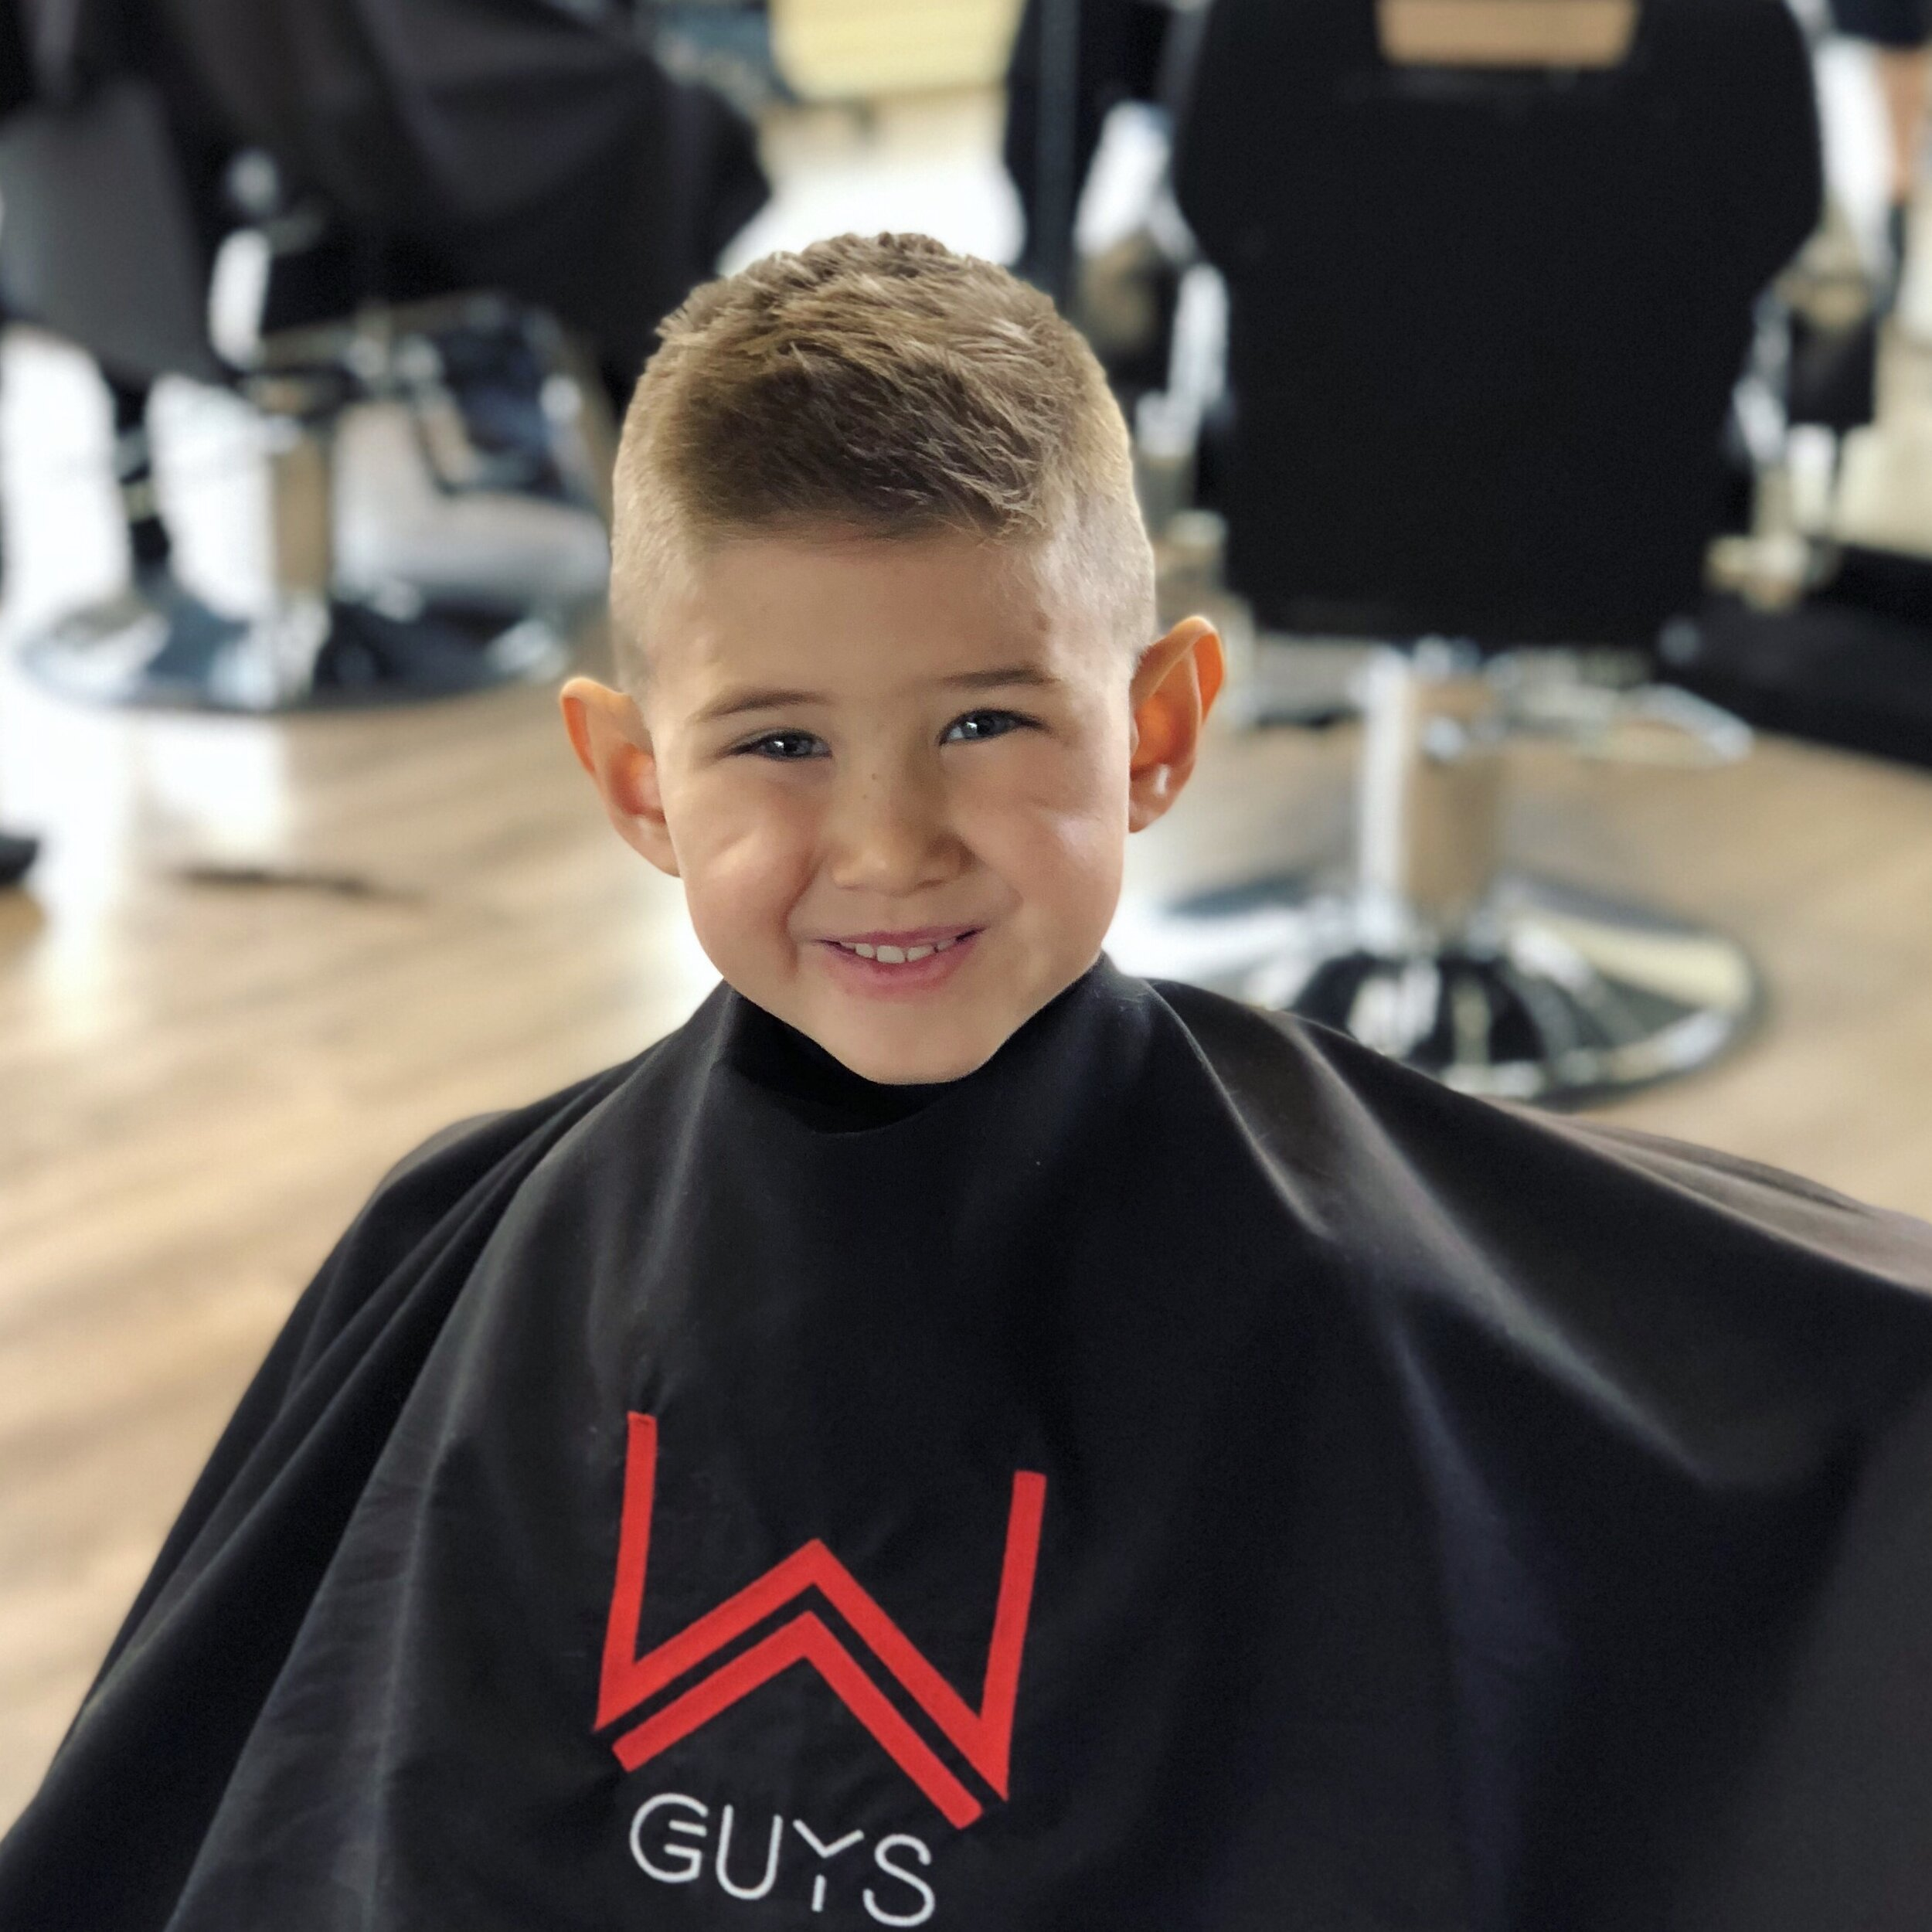 Boys Haircut and Trend's. W Barber Spa & Salon